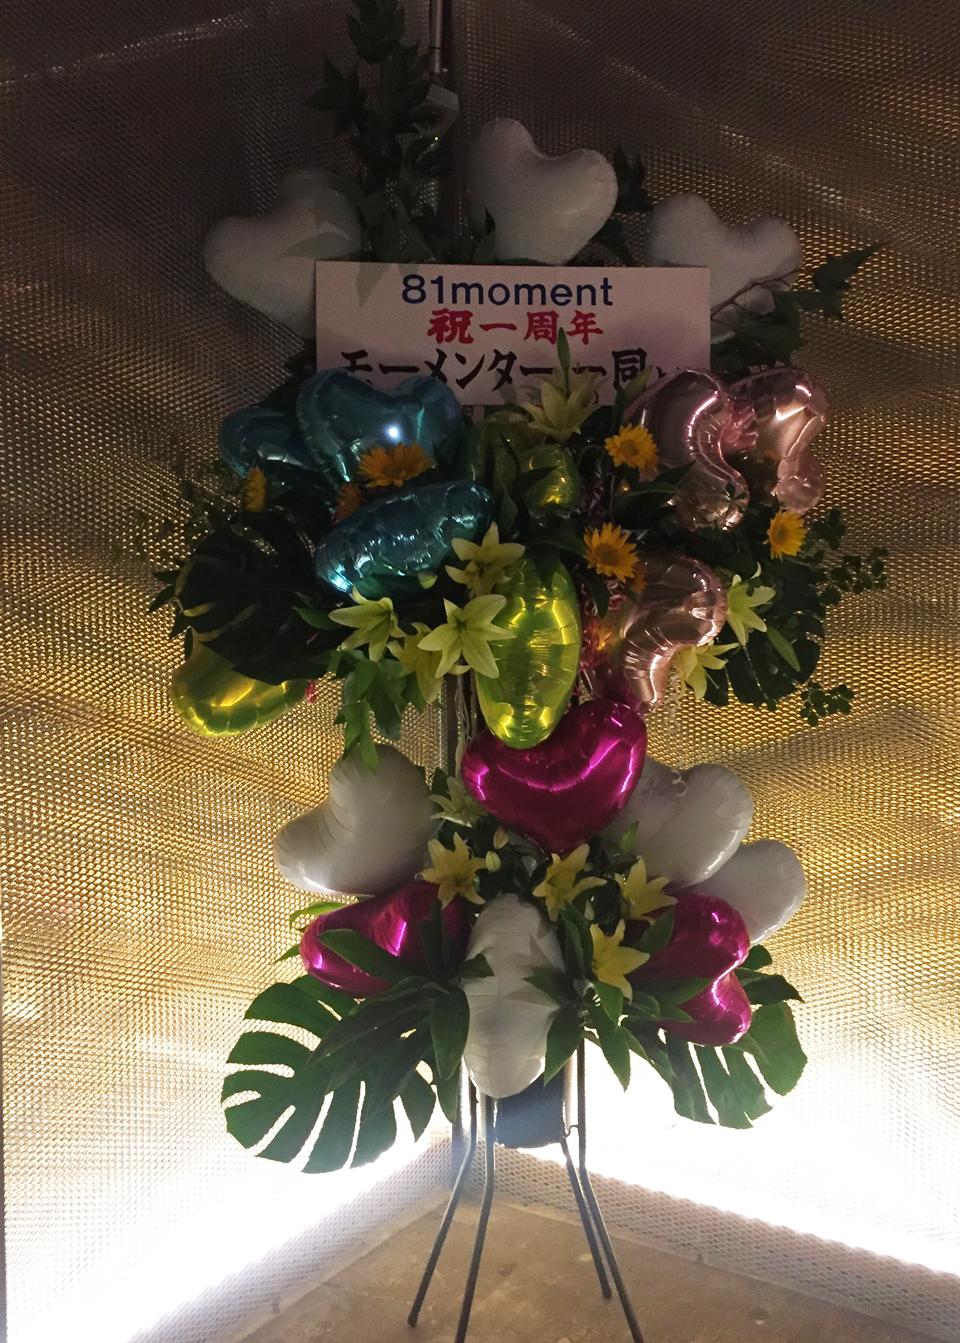 81moment、1周年記念ライブ 花